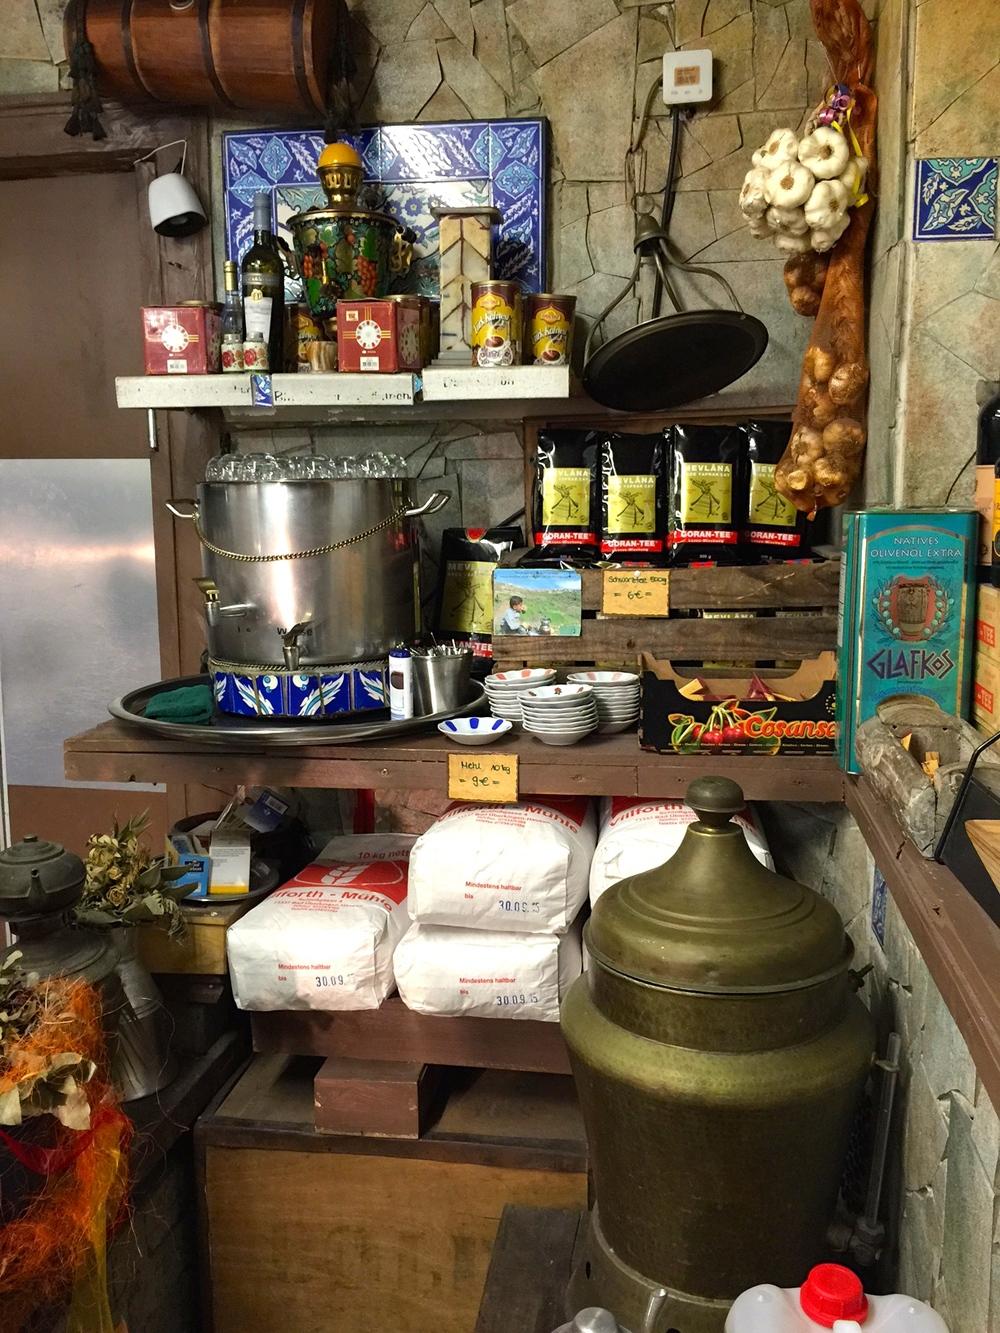 A peek inside the kitchen at Alaturka